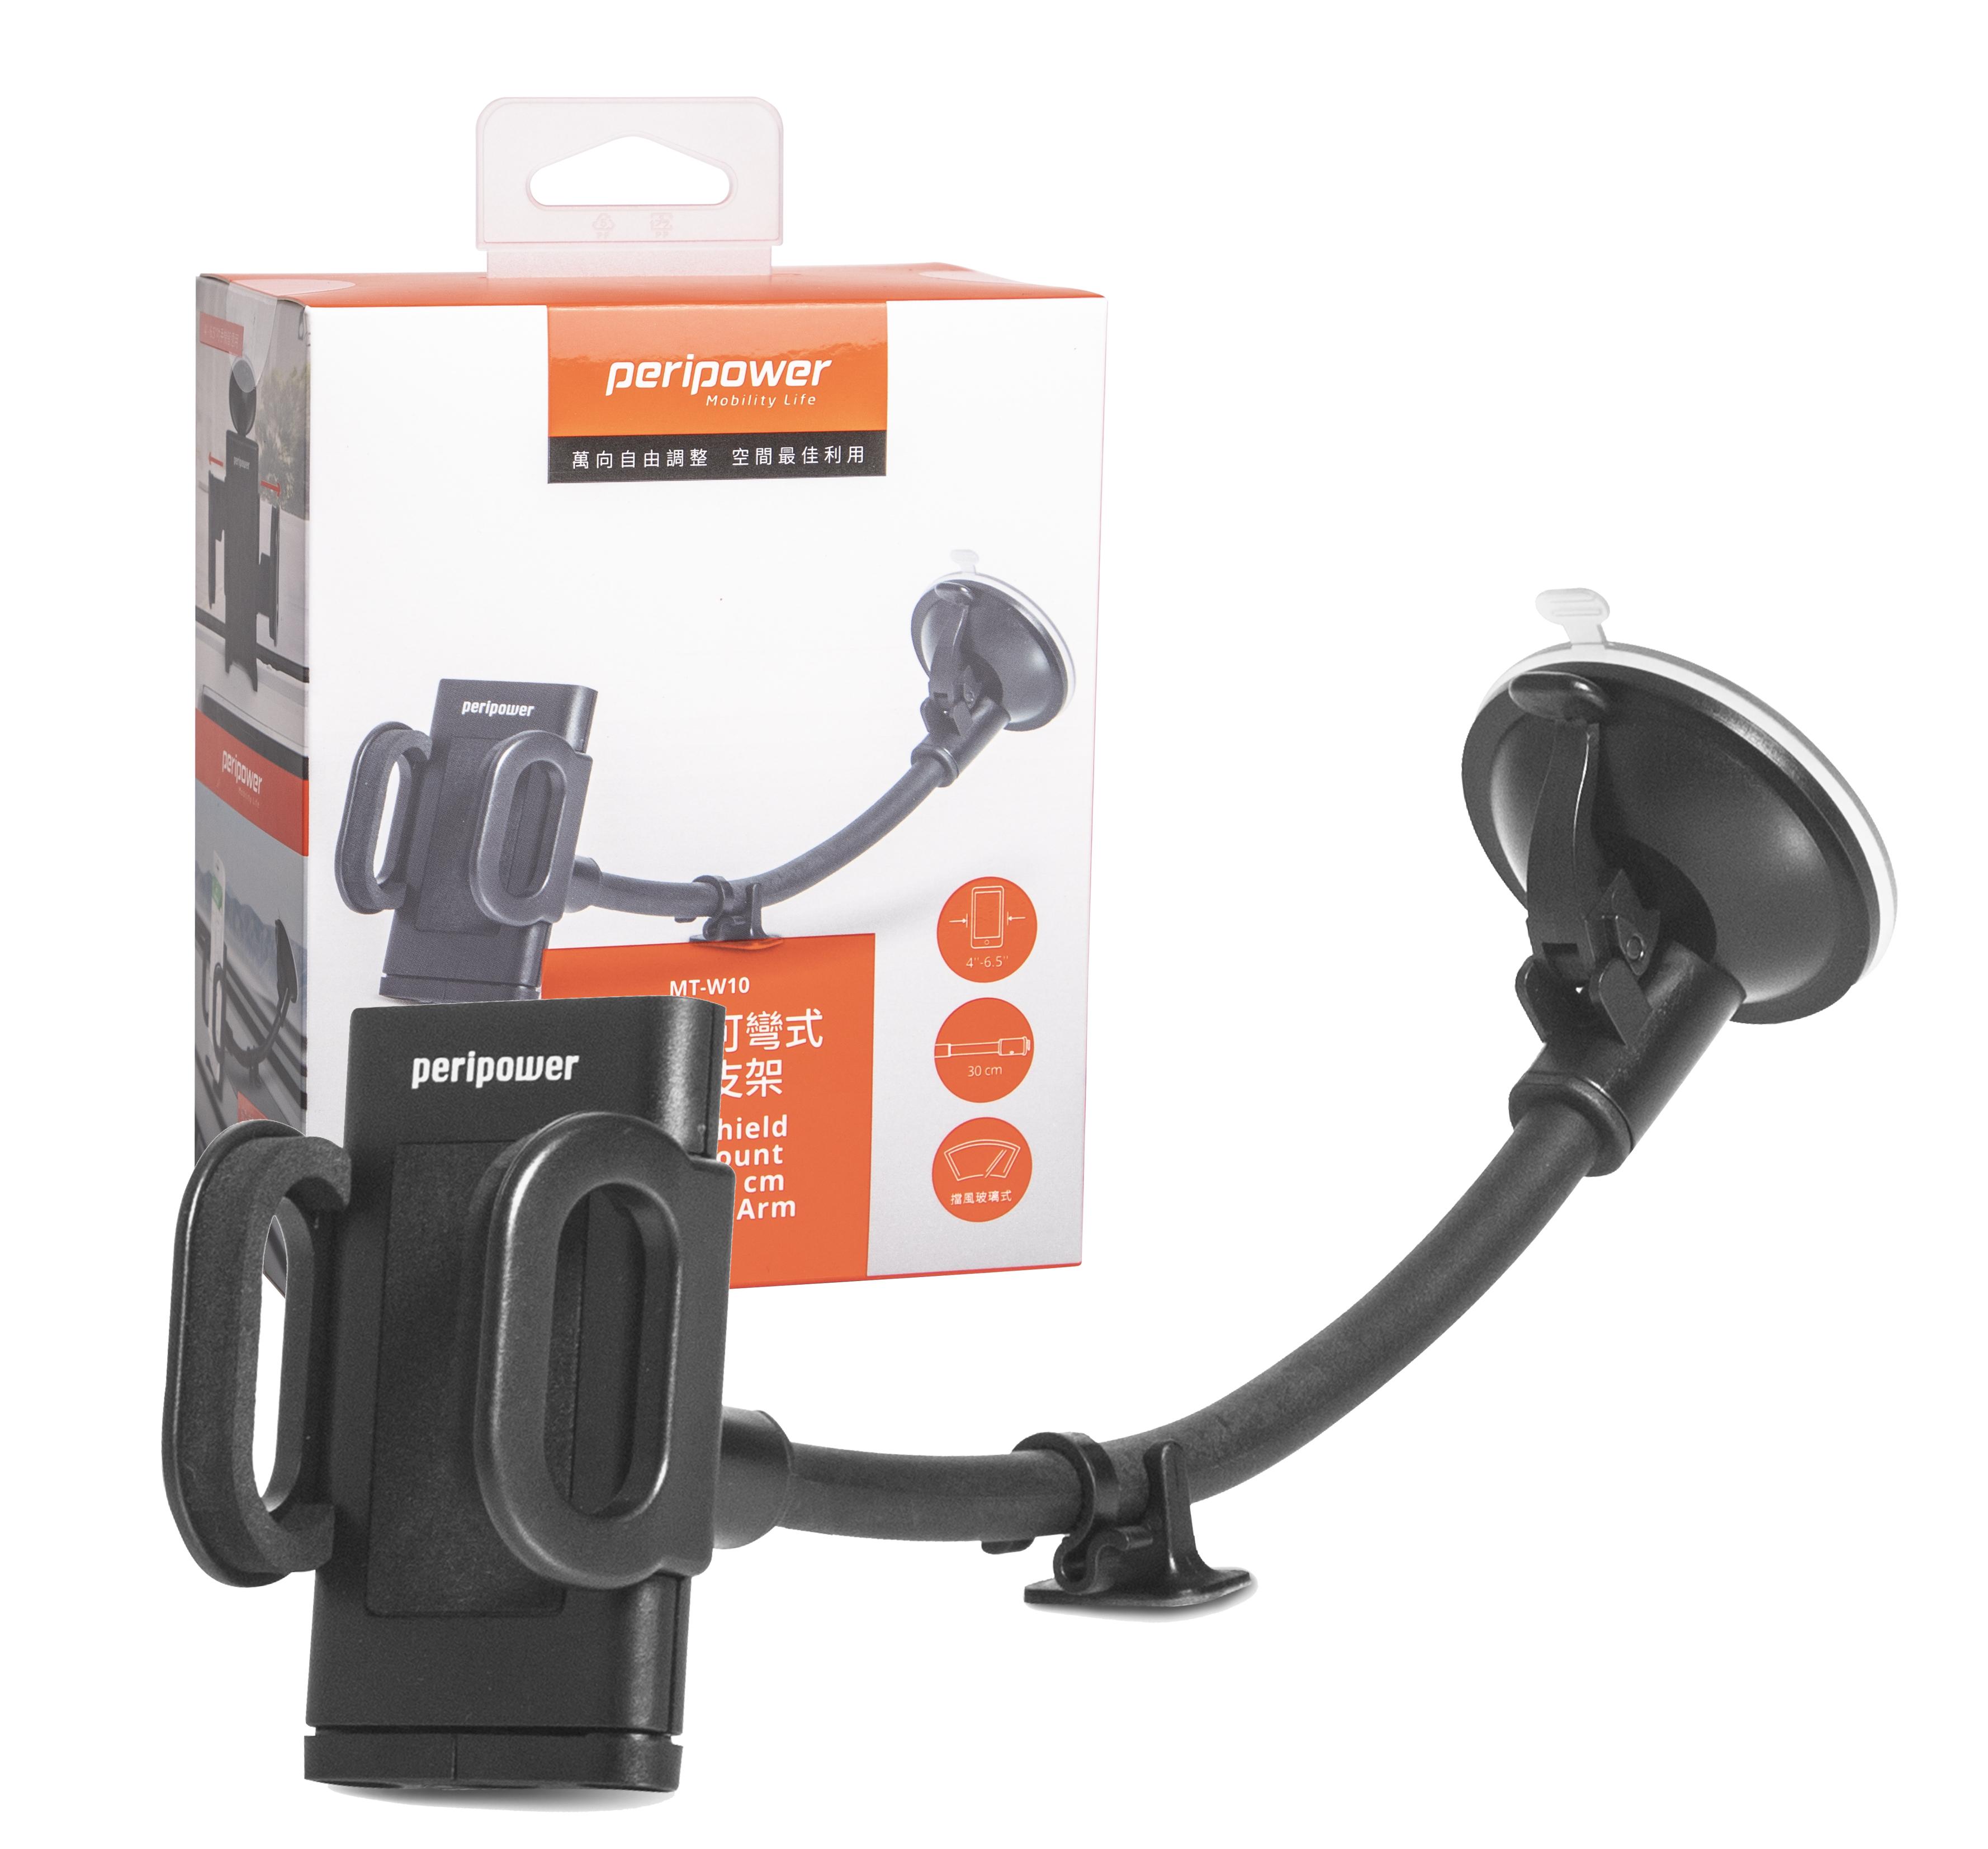 【peripower】MT-W10 可彎式鋁管支架 30cm 手機支架 手機車架 車載支架 萬用支架 吸盤支架 加長型